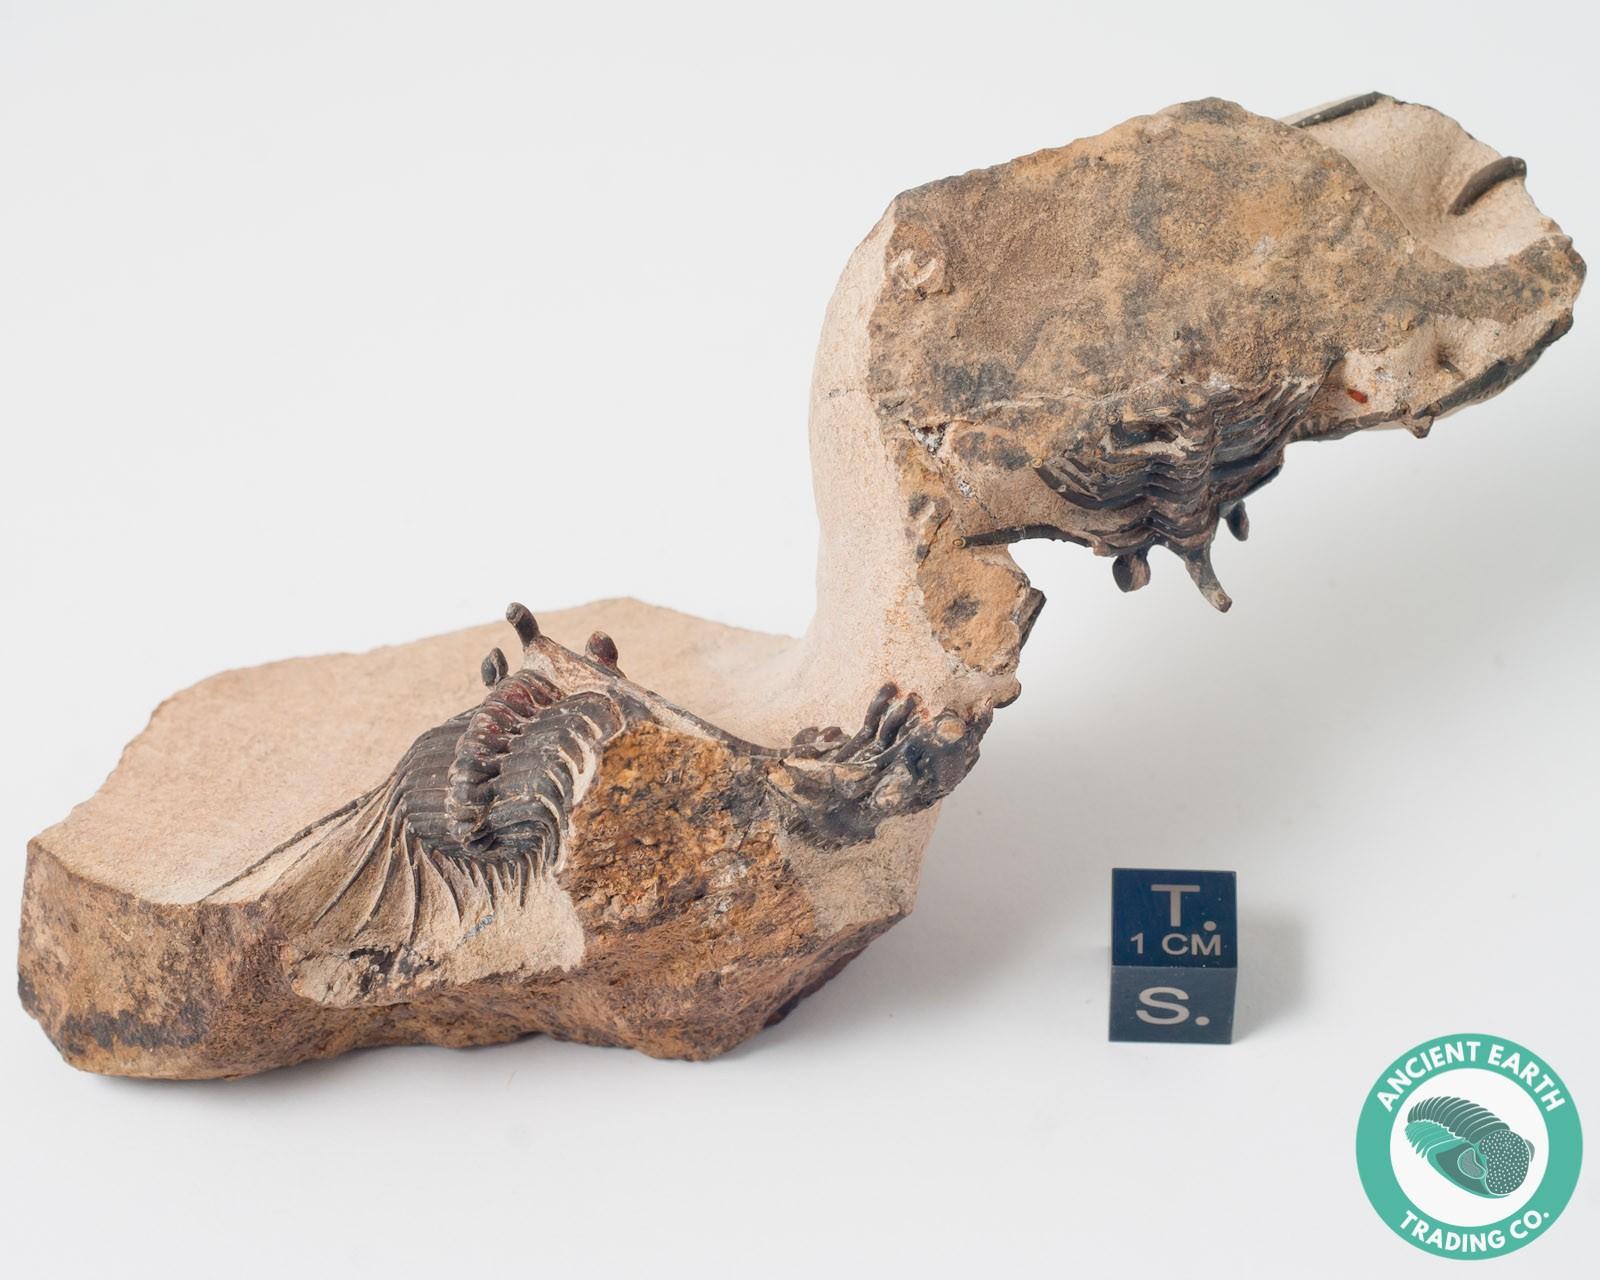 Kettneraspis Stovepipe Mass Mortality Trilobite Fossil - Morocco